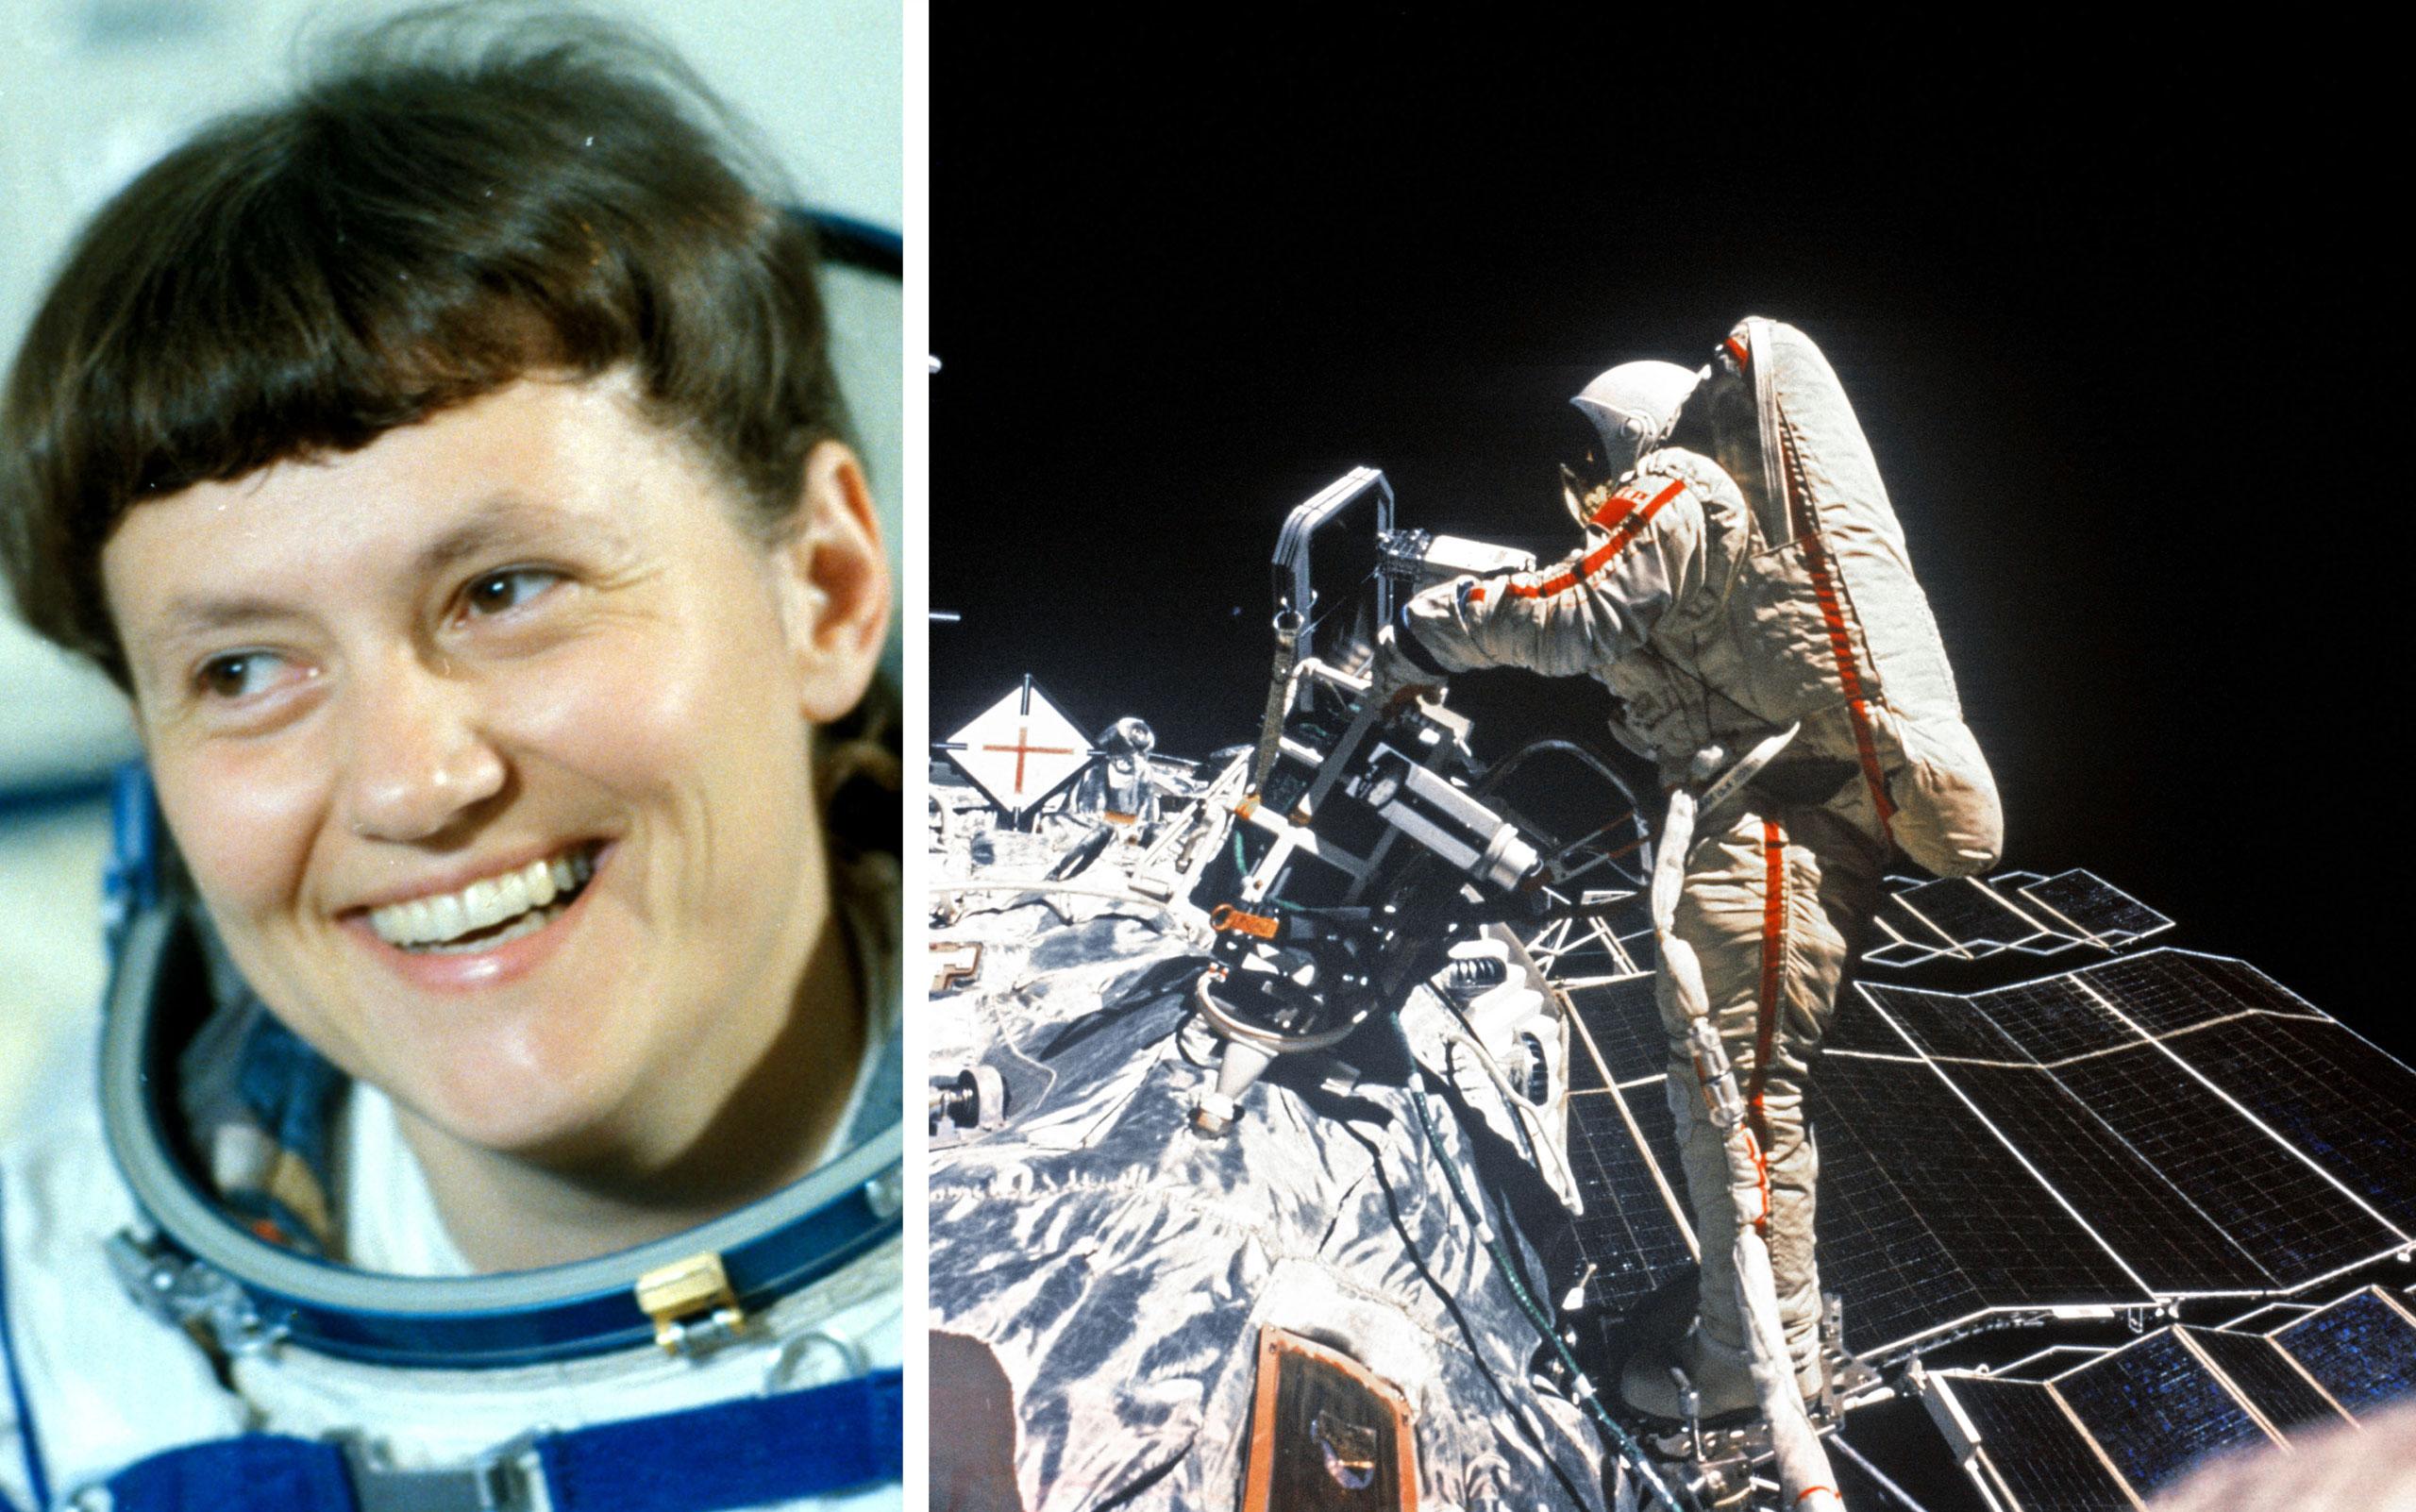 Soviet cosmonaut svetlana savitskaya, the first woman to walk in space during the soyuz t-12 space mission to the salyut 7 space station in august 1984, photo was taken by cosmonaut vladimir dzhanibekov.